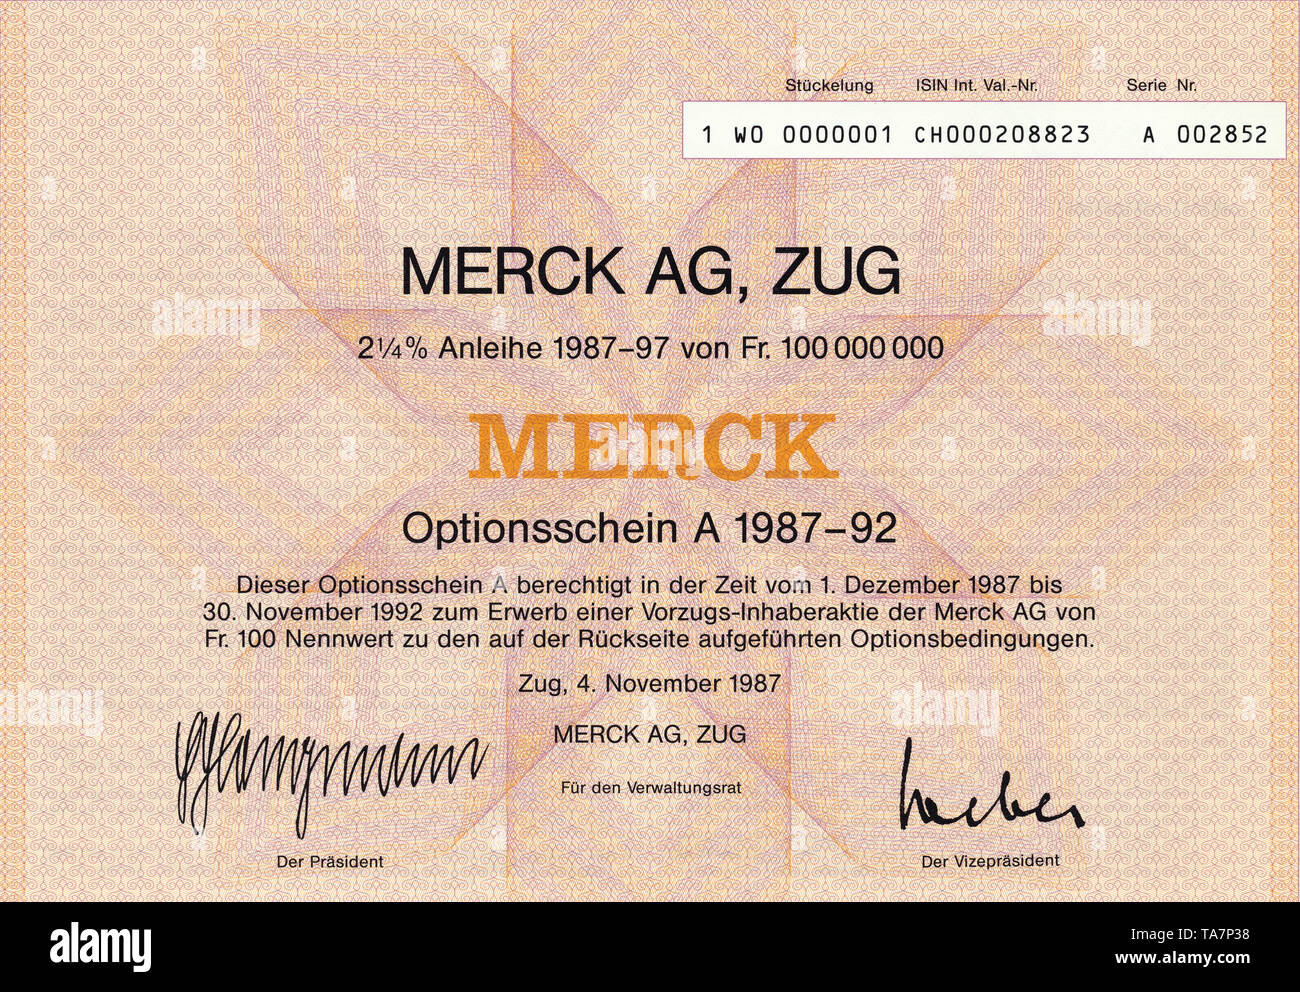 Historic stock certificate, Securities certificate, bearer warrant, chemical and pharmaceutical industry, Wertpapier, Inhaber-Optionsschein, Schweizer Franken, Chemie- und Pharmaindustrie, Merck AG, Zug, 1987, Schweiz, Europa - Stock Image